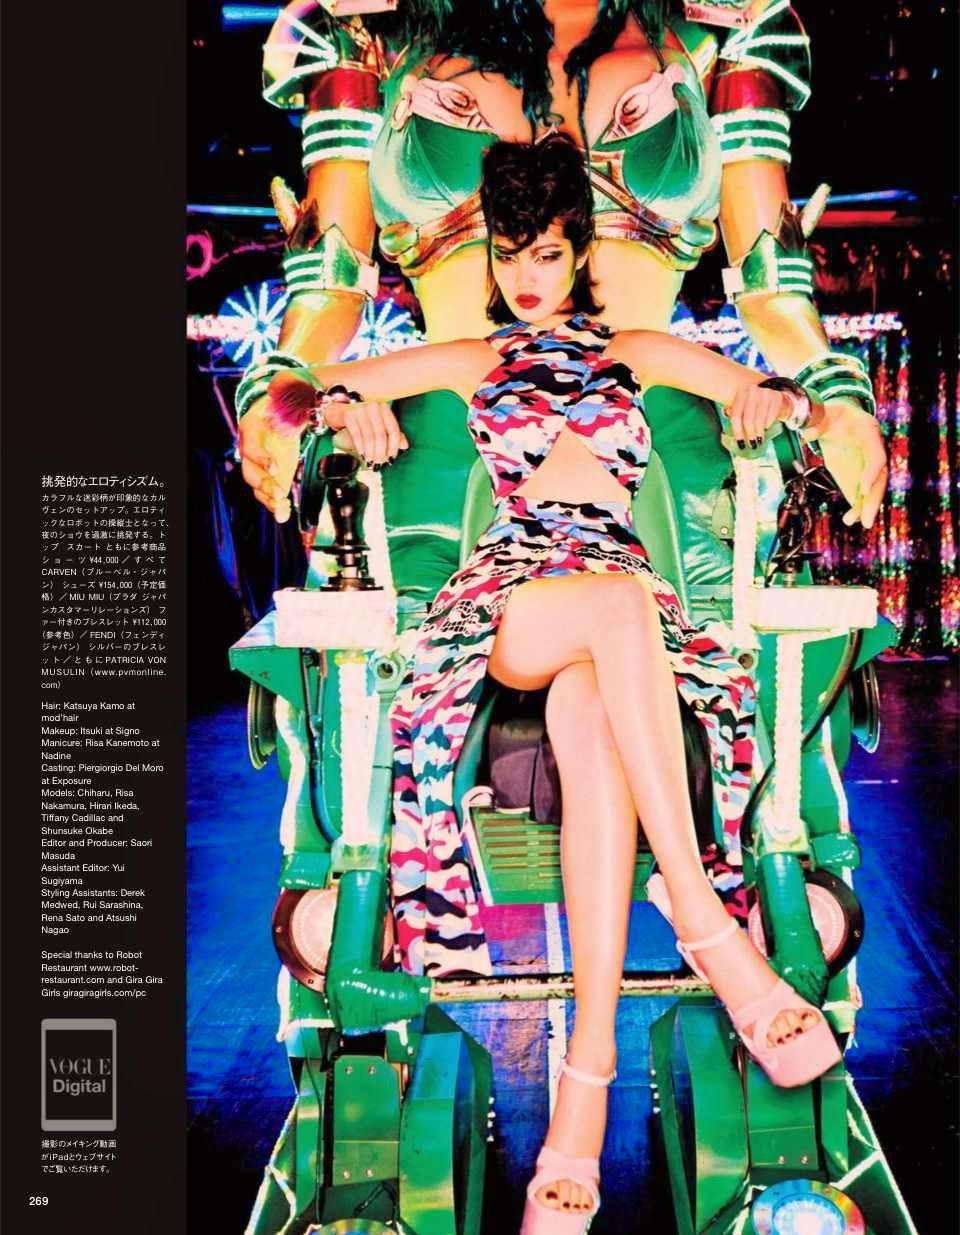 Tokyo Neon Girls: #ChiharuOkunugi & more by #EllenVonUnwerth for #VogueJapan July 2014